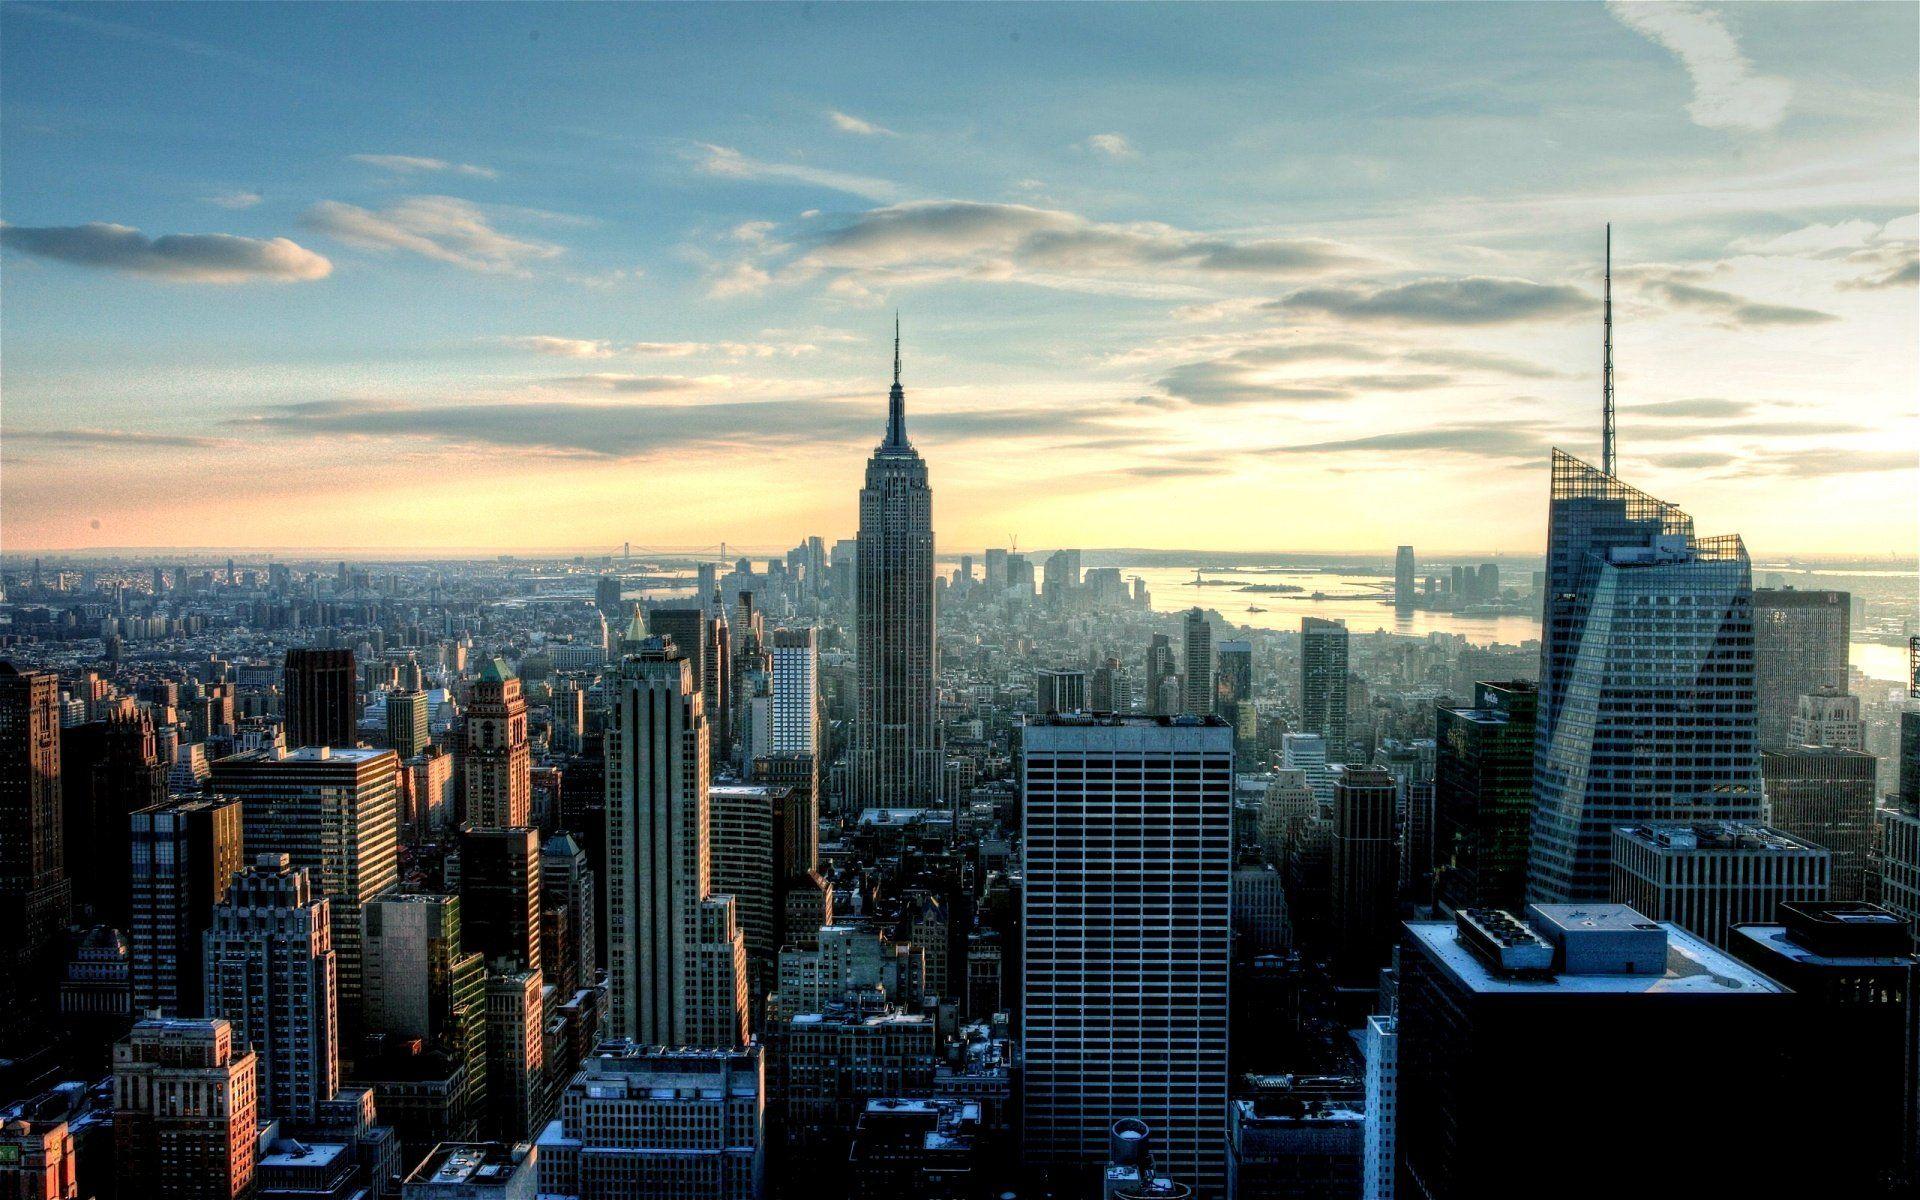 Early Morning New York City New York Wallpaper Macbook Pro Wallpaper City Wallpaper